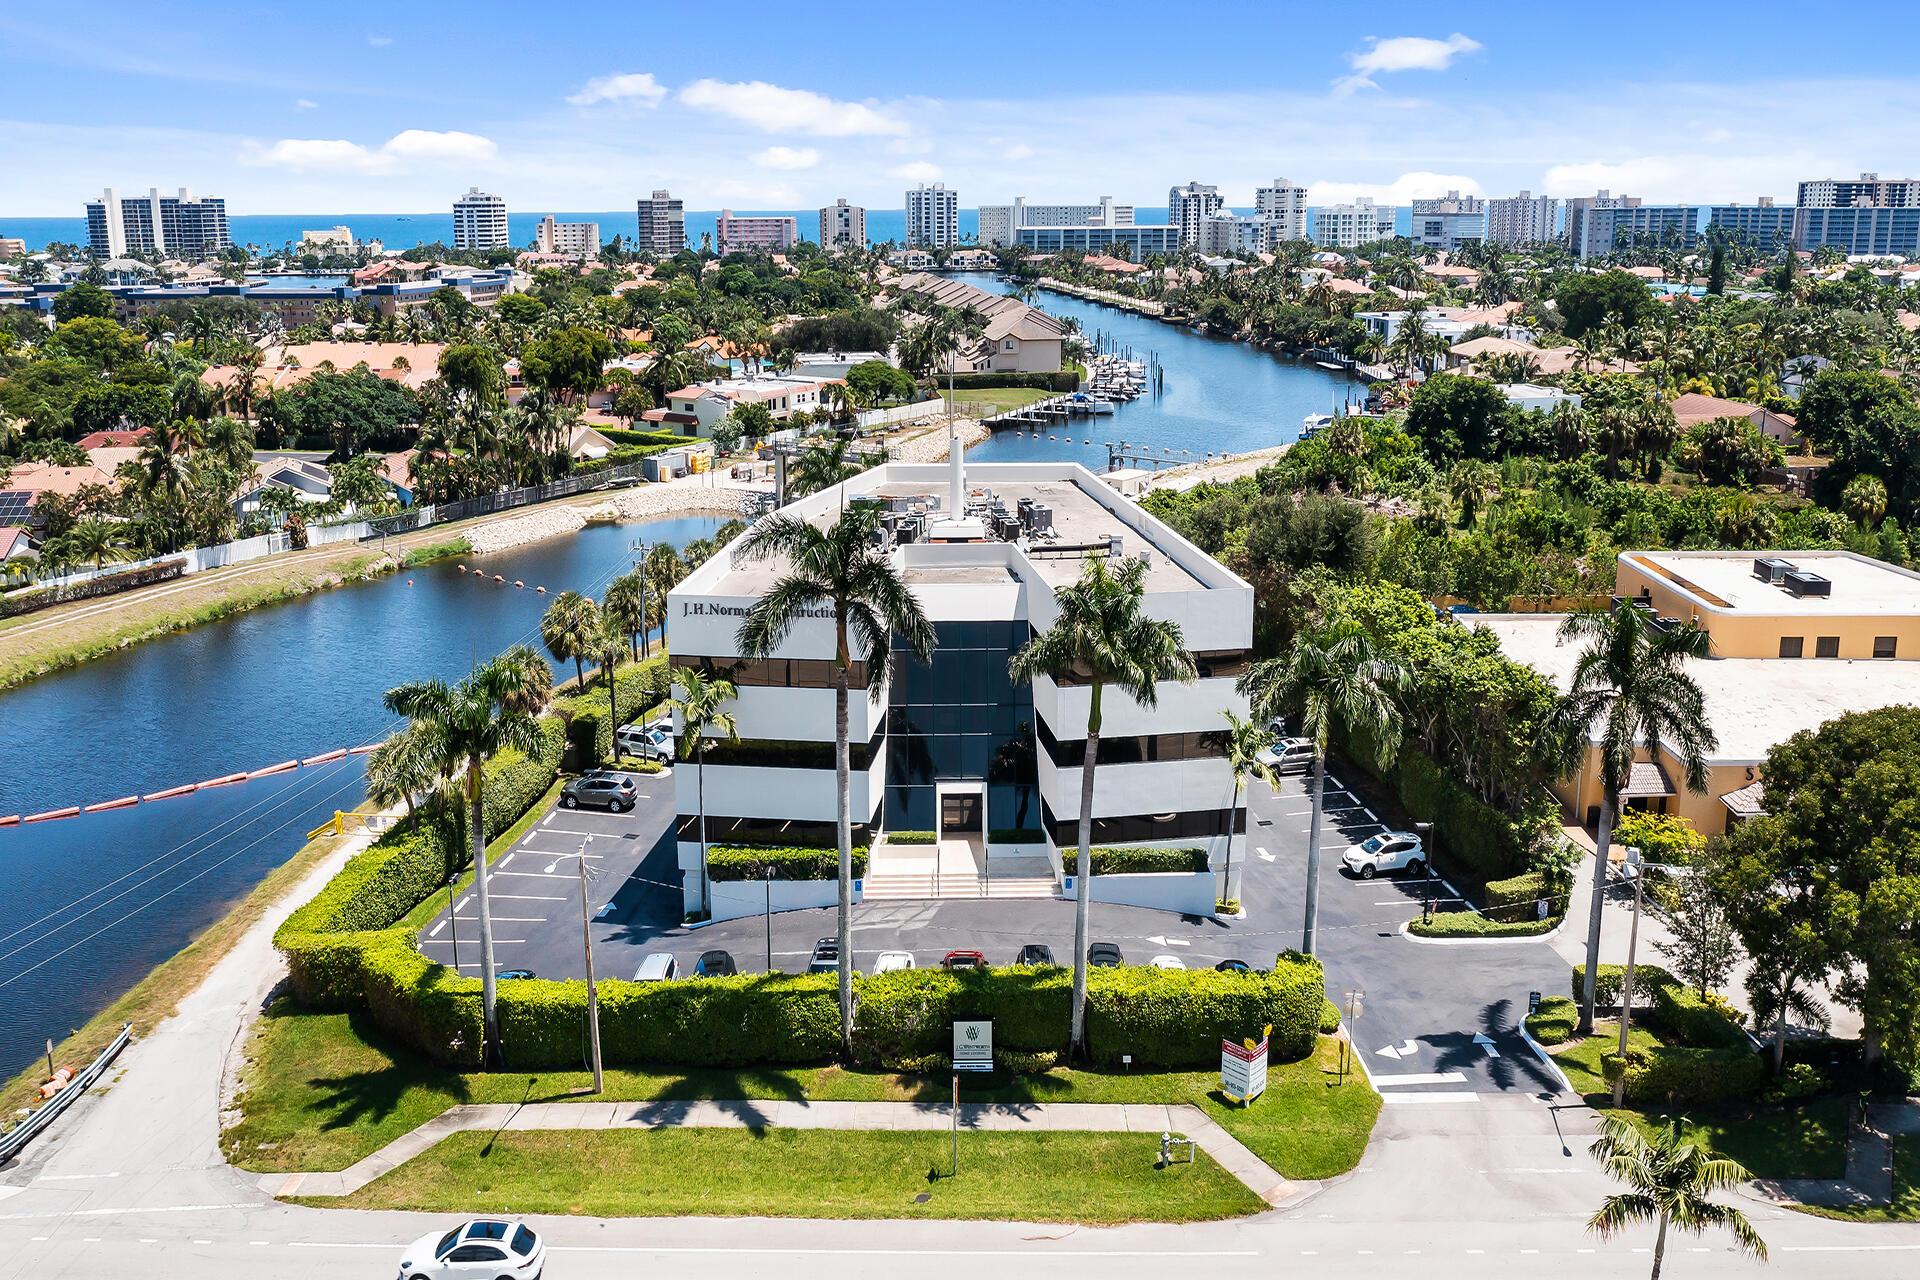 8000 N Federal, Boca Raton, Florida 33487